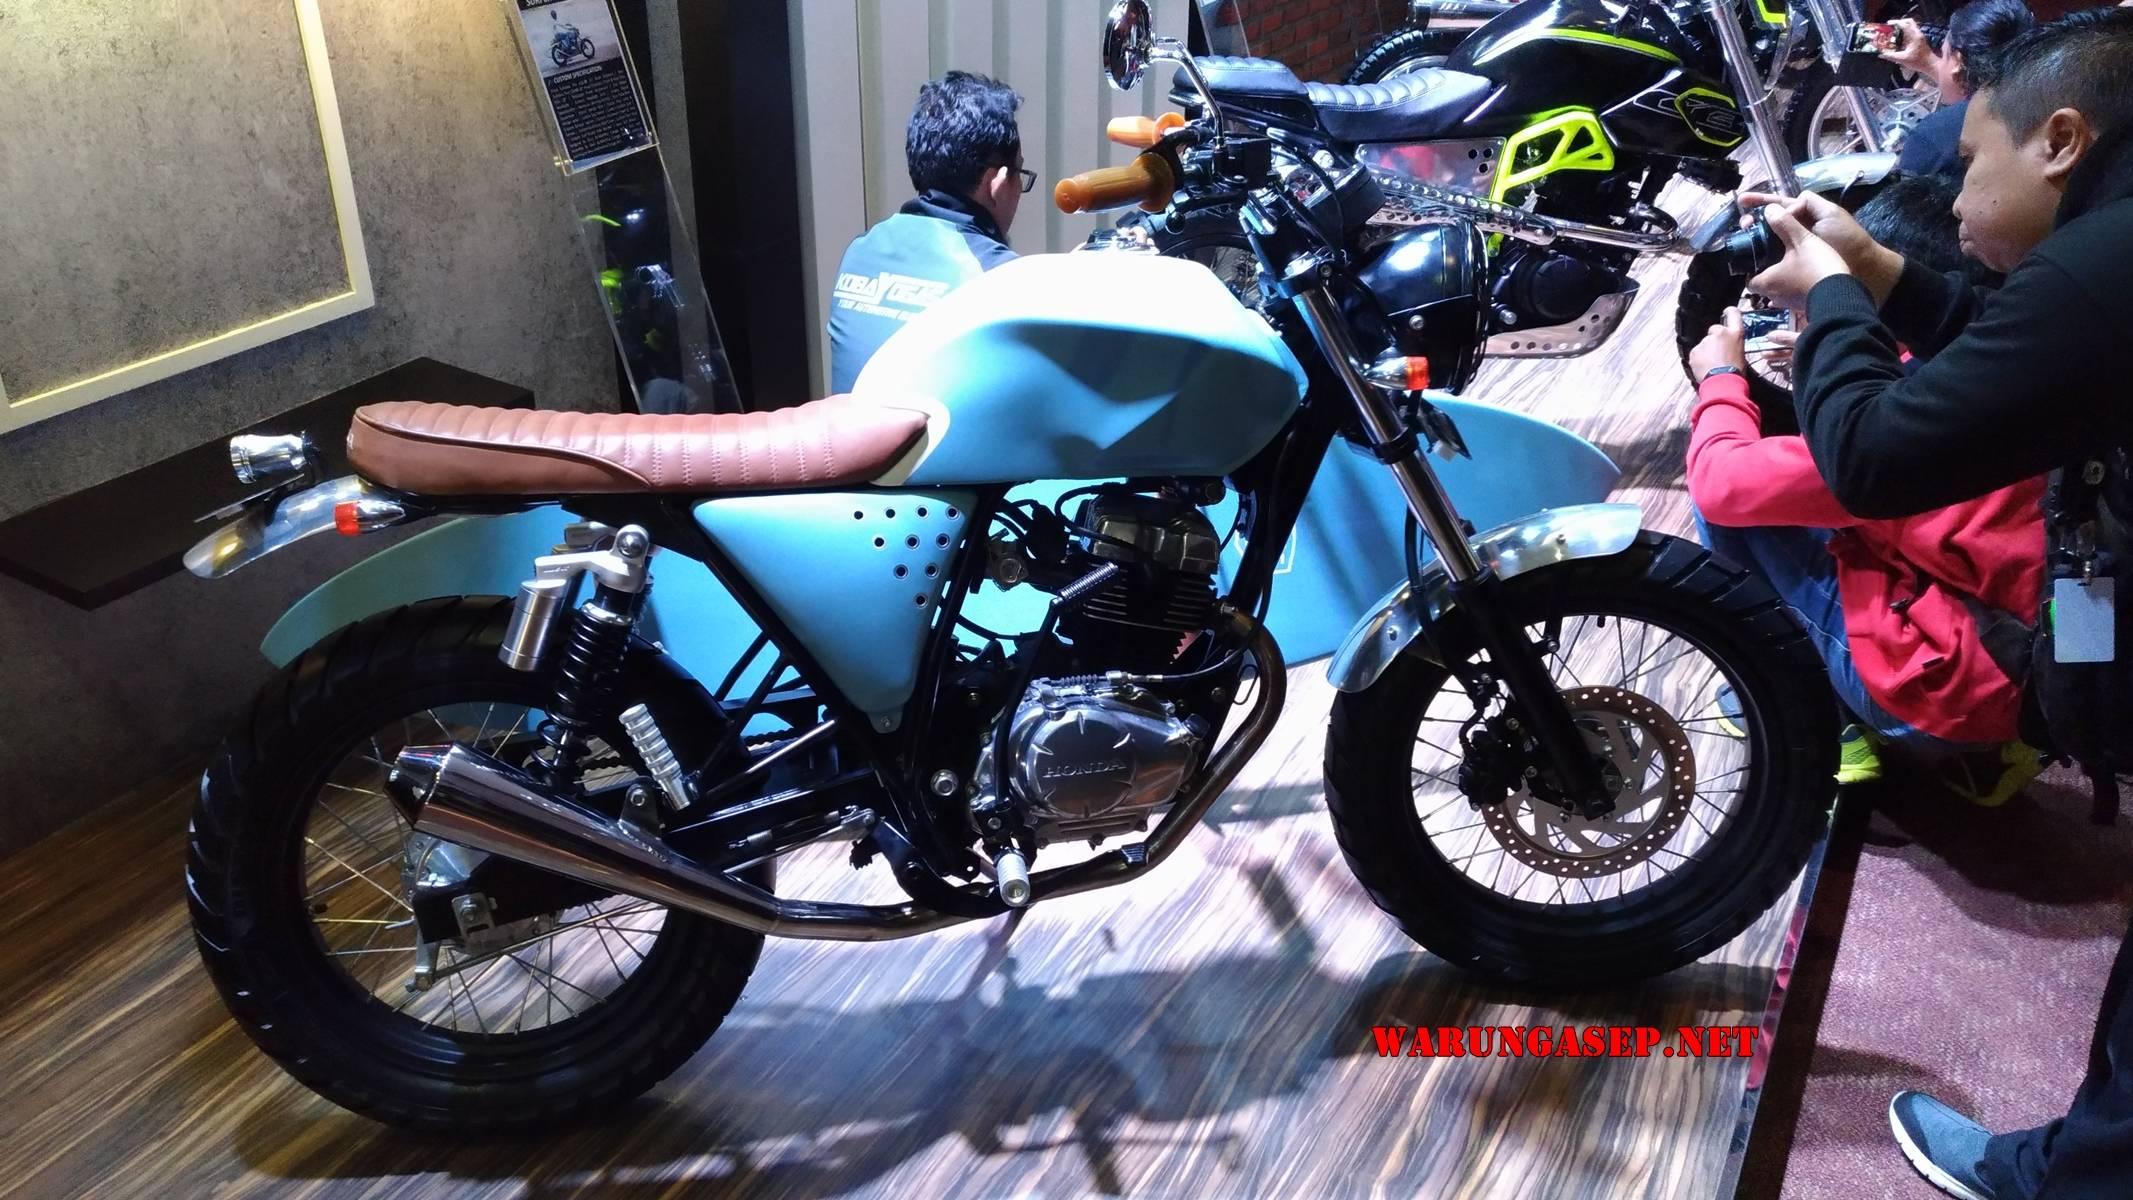 Modifikasi Honda CB150 Verza Bergaya JapStyle Karya Deus Exmachina